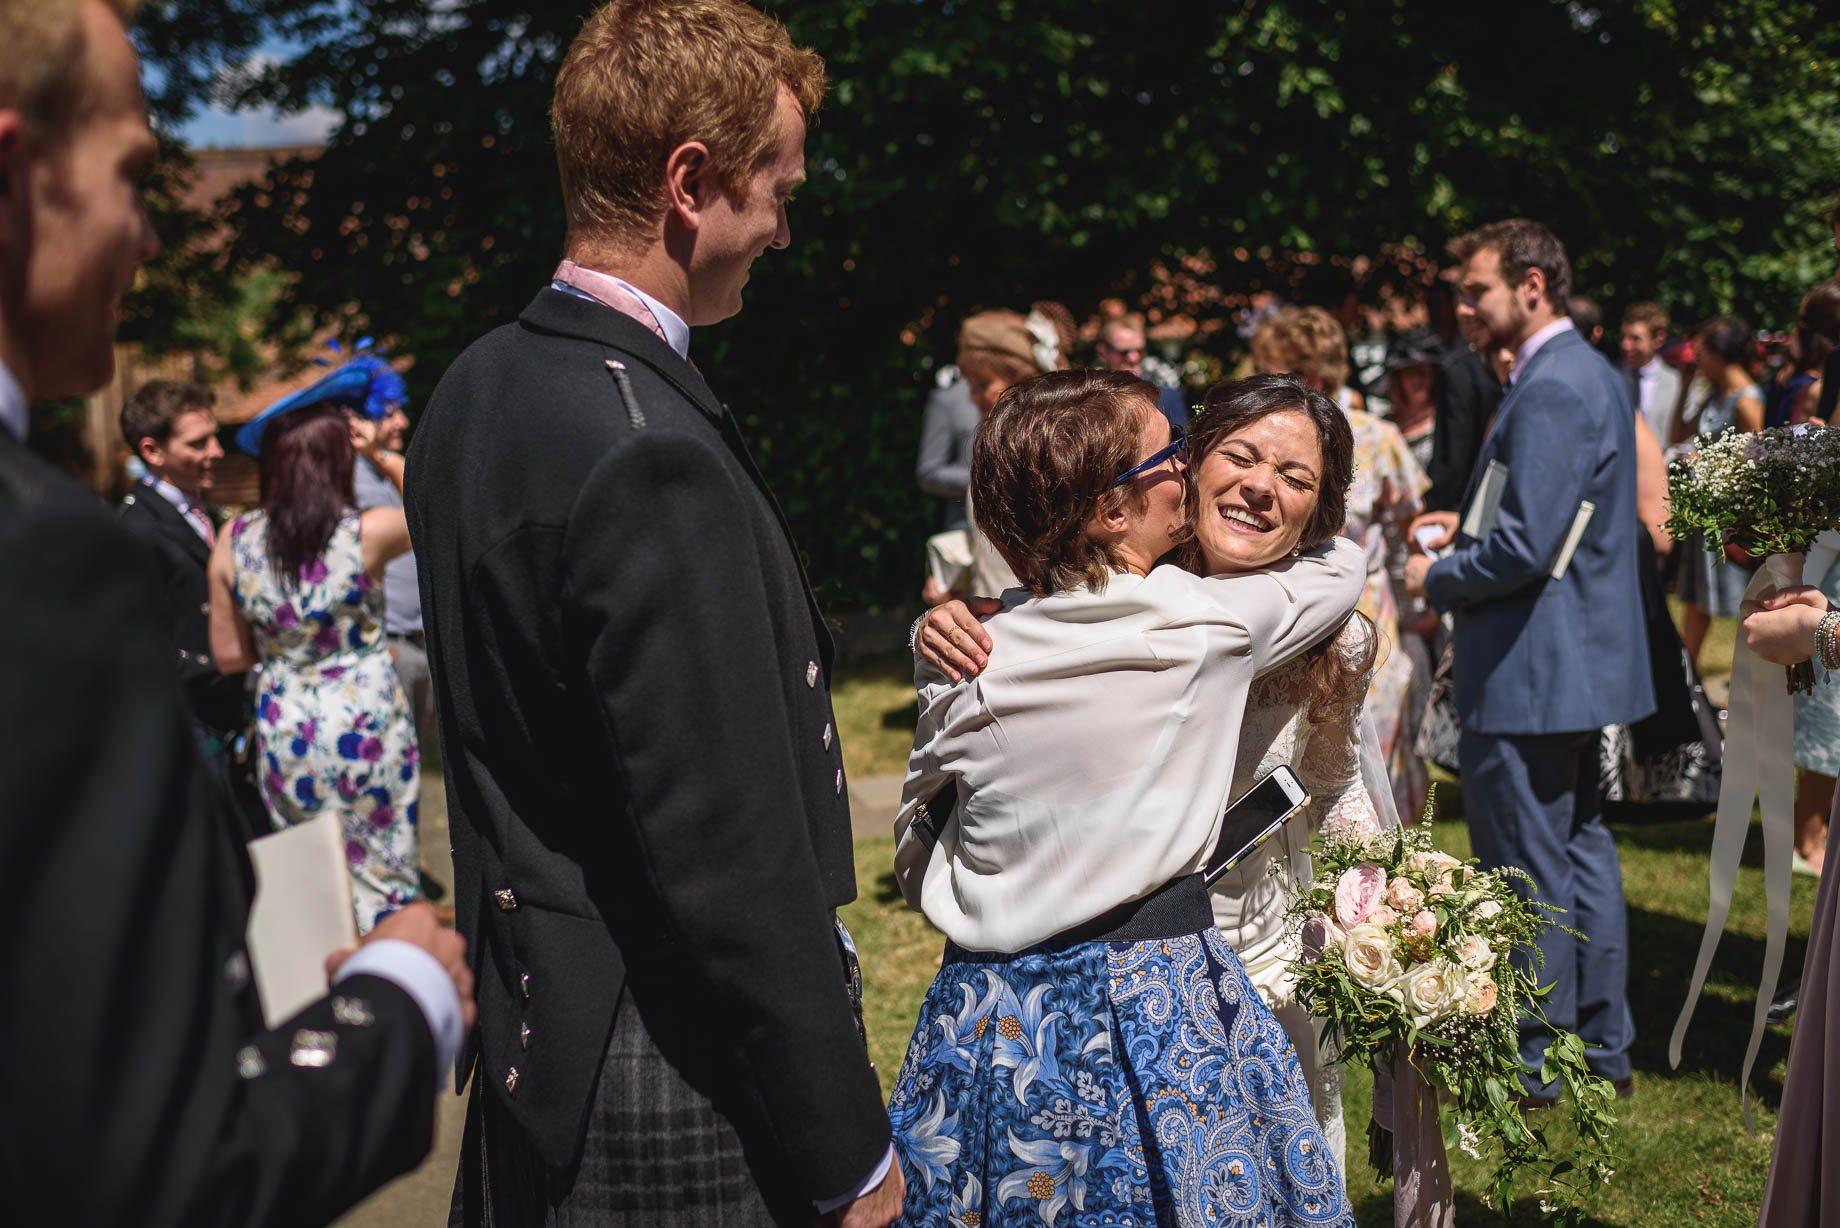 Gildings Barn wedding photography - Sarah and Steve (74 of 190)